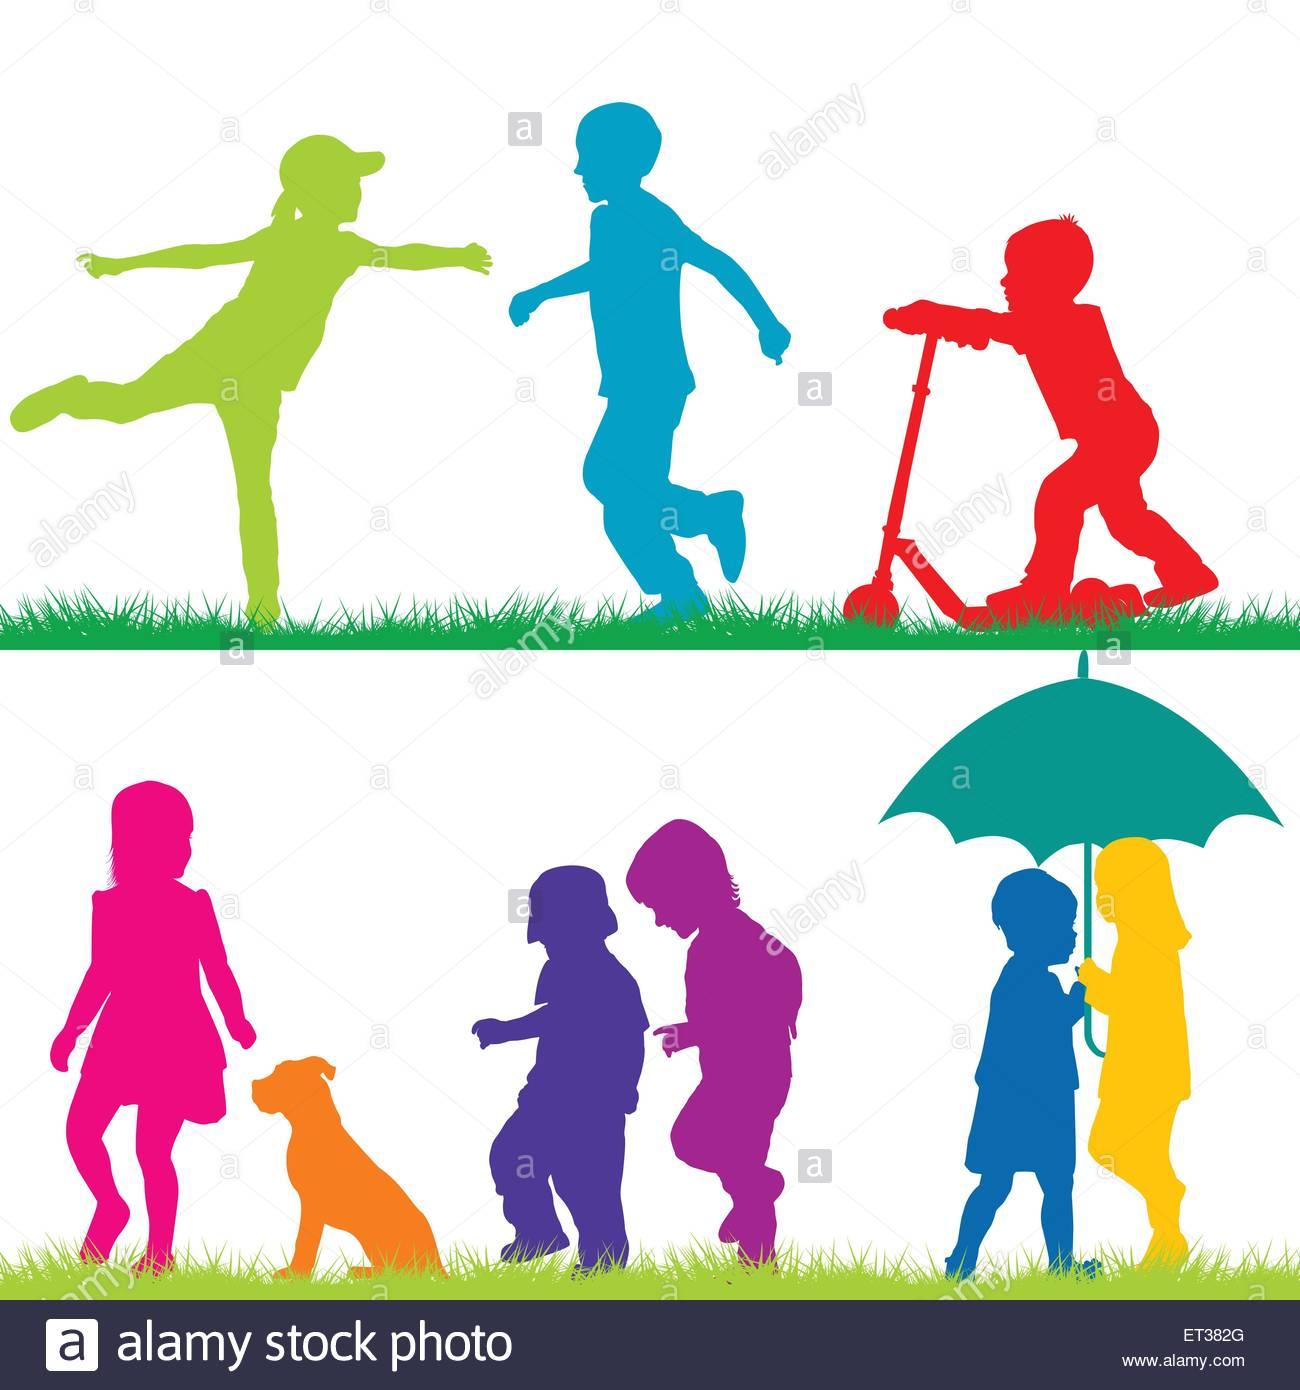 1300x1390 Children Silhouettes Playing Stock Vector Art Amp Illustration